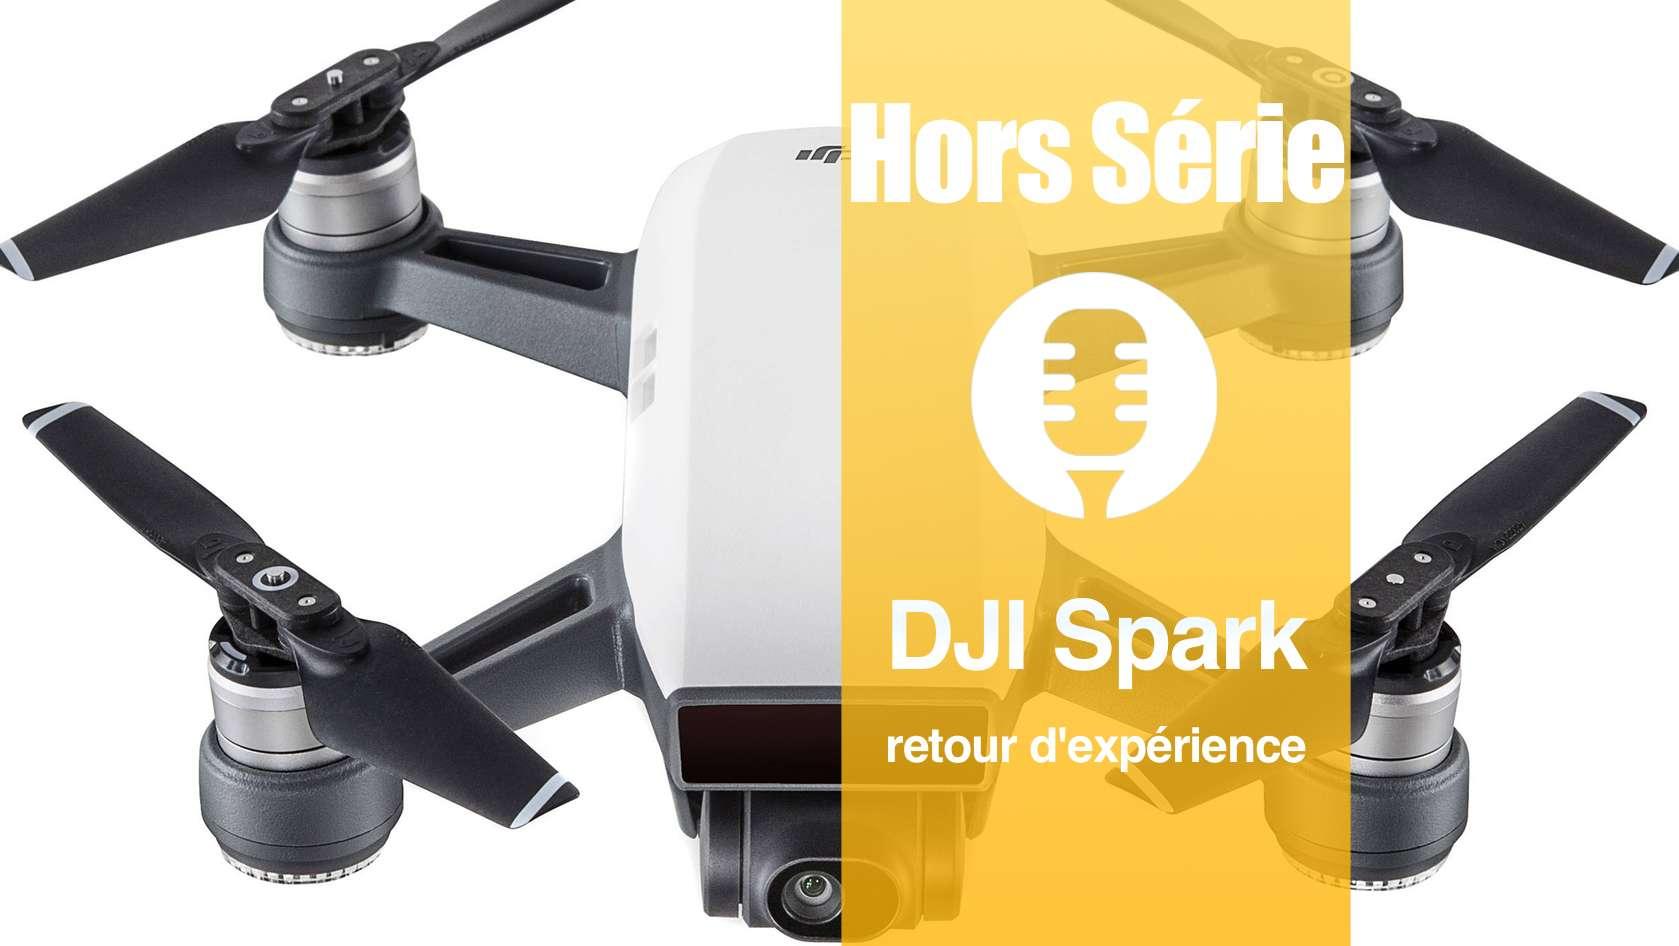 DJI Spark : retour d'expérience